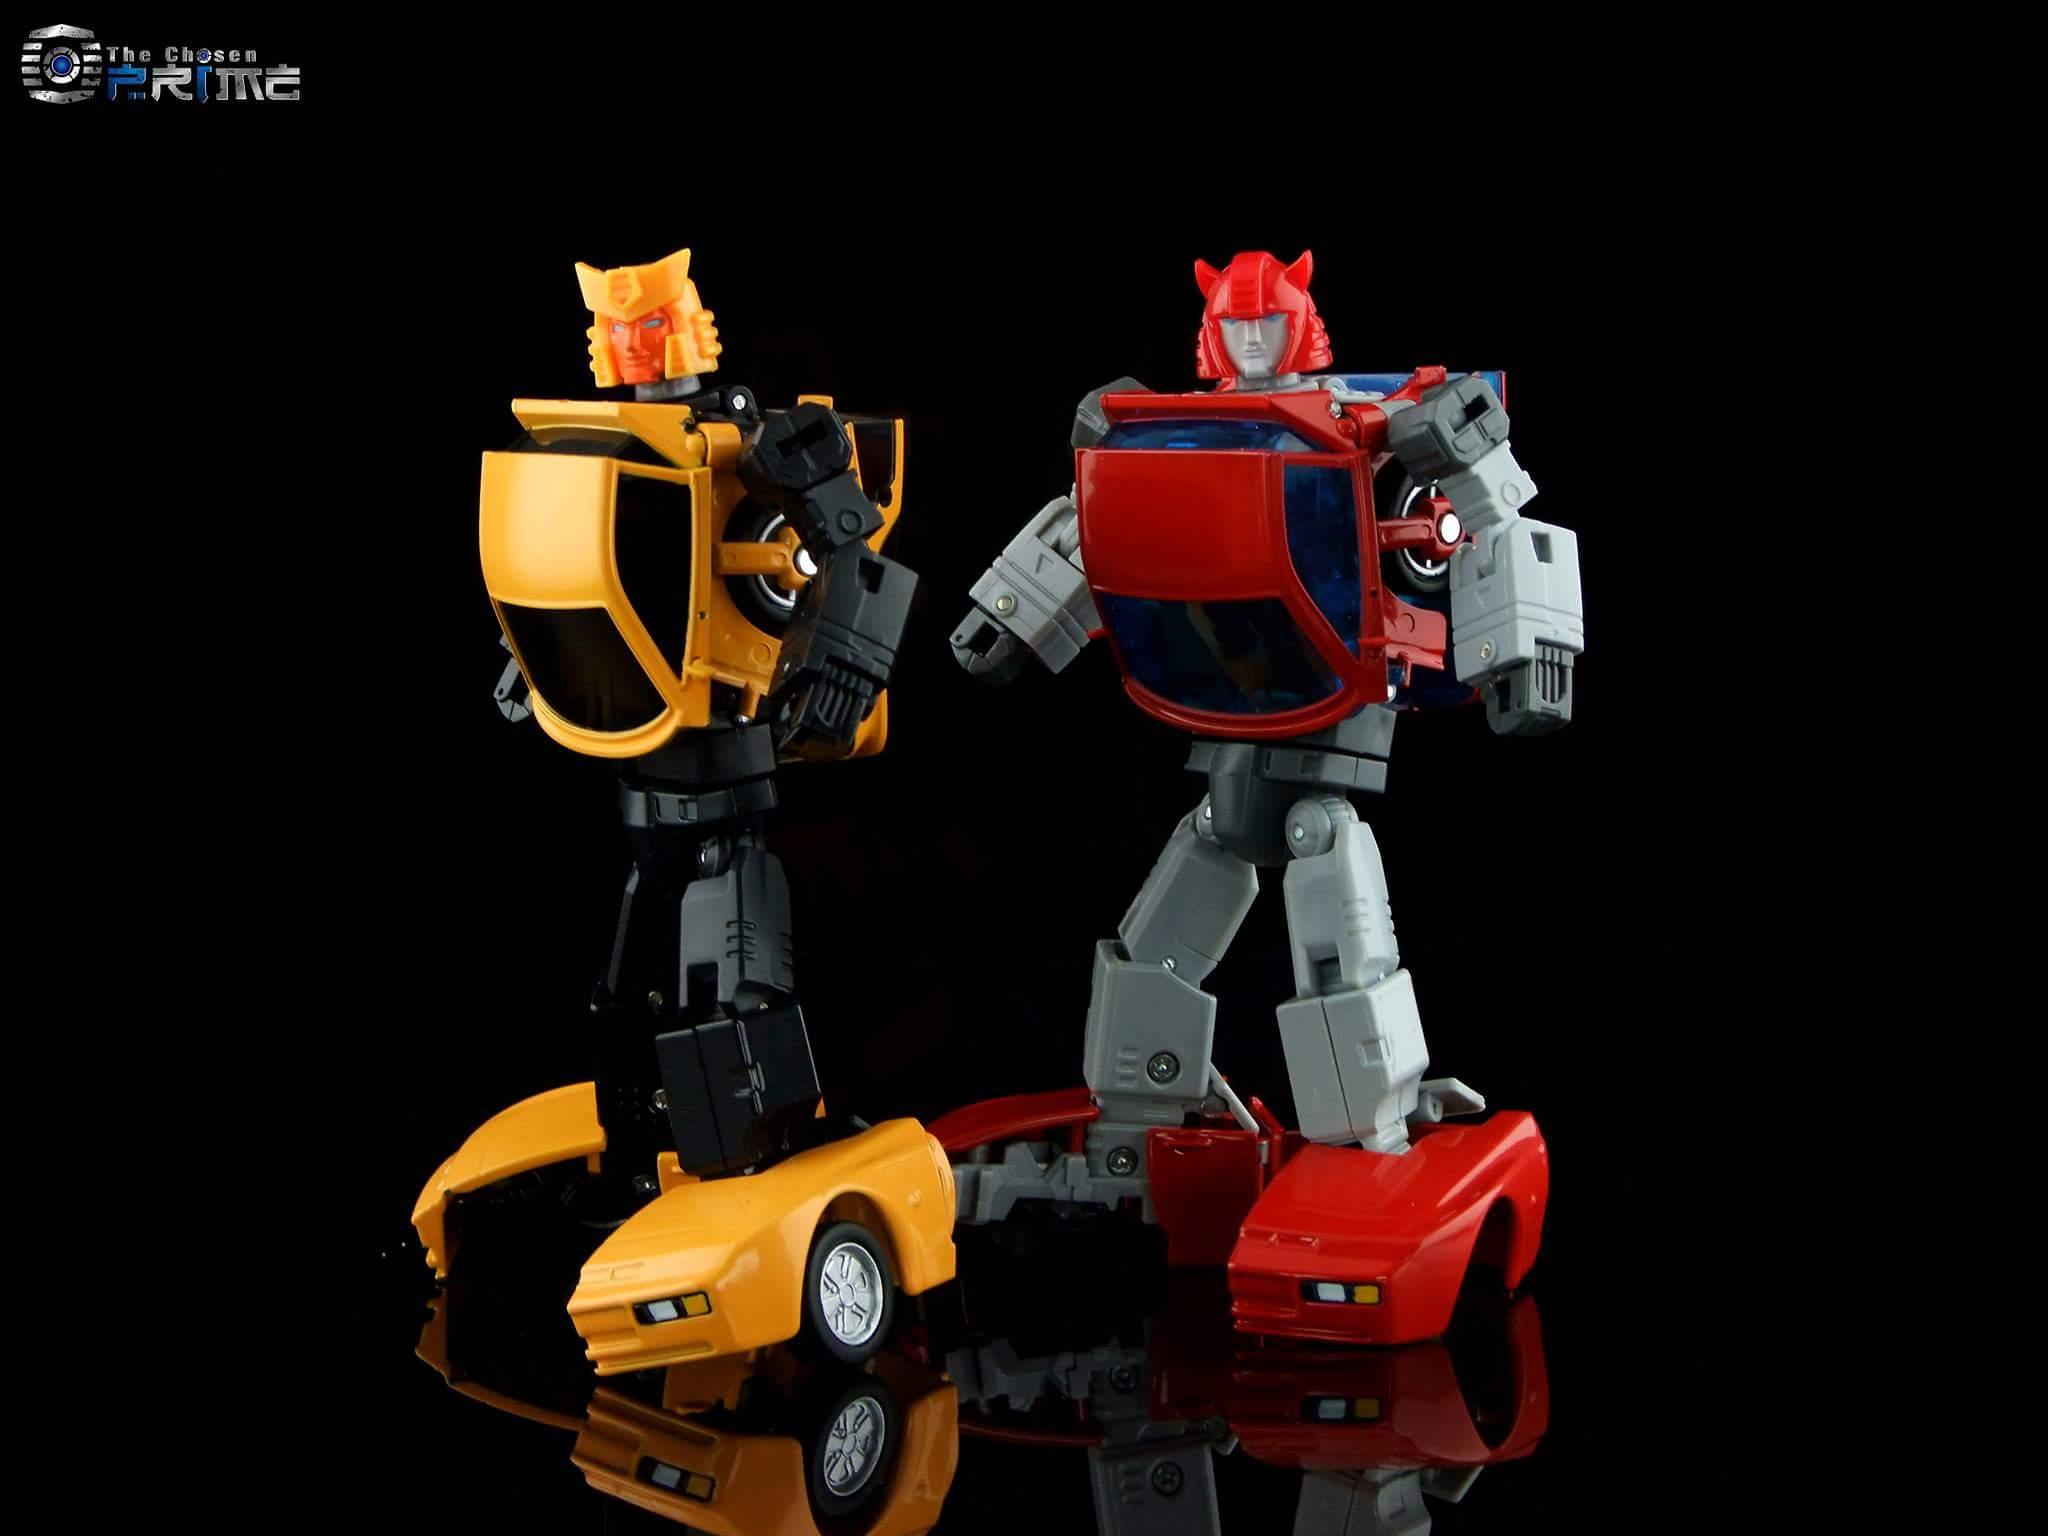 [ACE Collectables] Produit Tiers - Minibots MP - ACE-01 Tumbler (aka Cliffjumper/Matamore), ACE-02 Hiccups (aka Hubcap/Virevolto), ACE-03 Trident (aka Seaspray/Embruns) Kv4xNAoJ